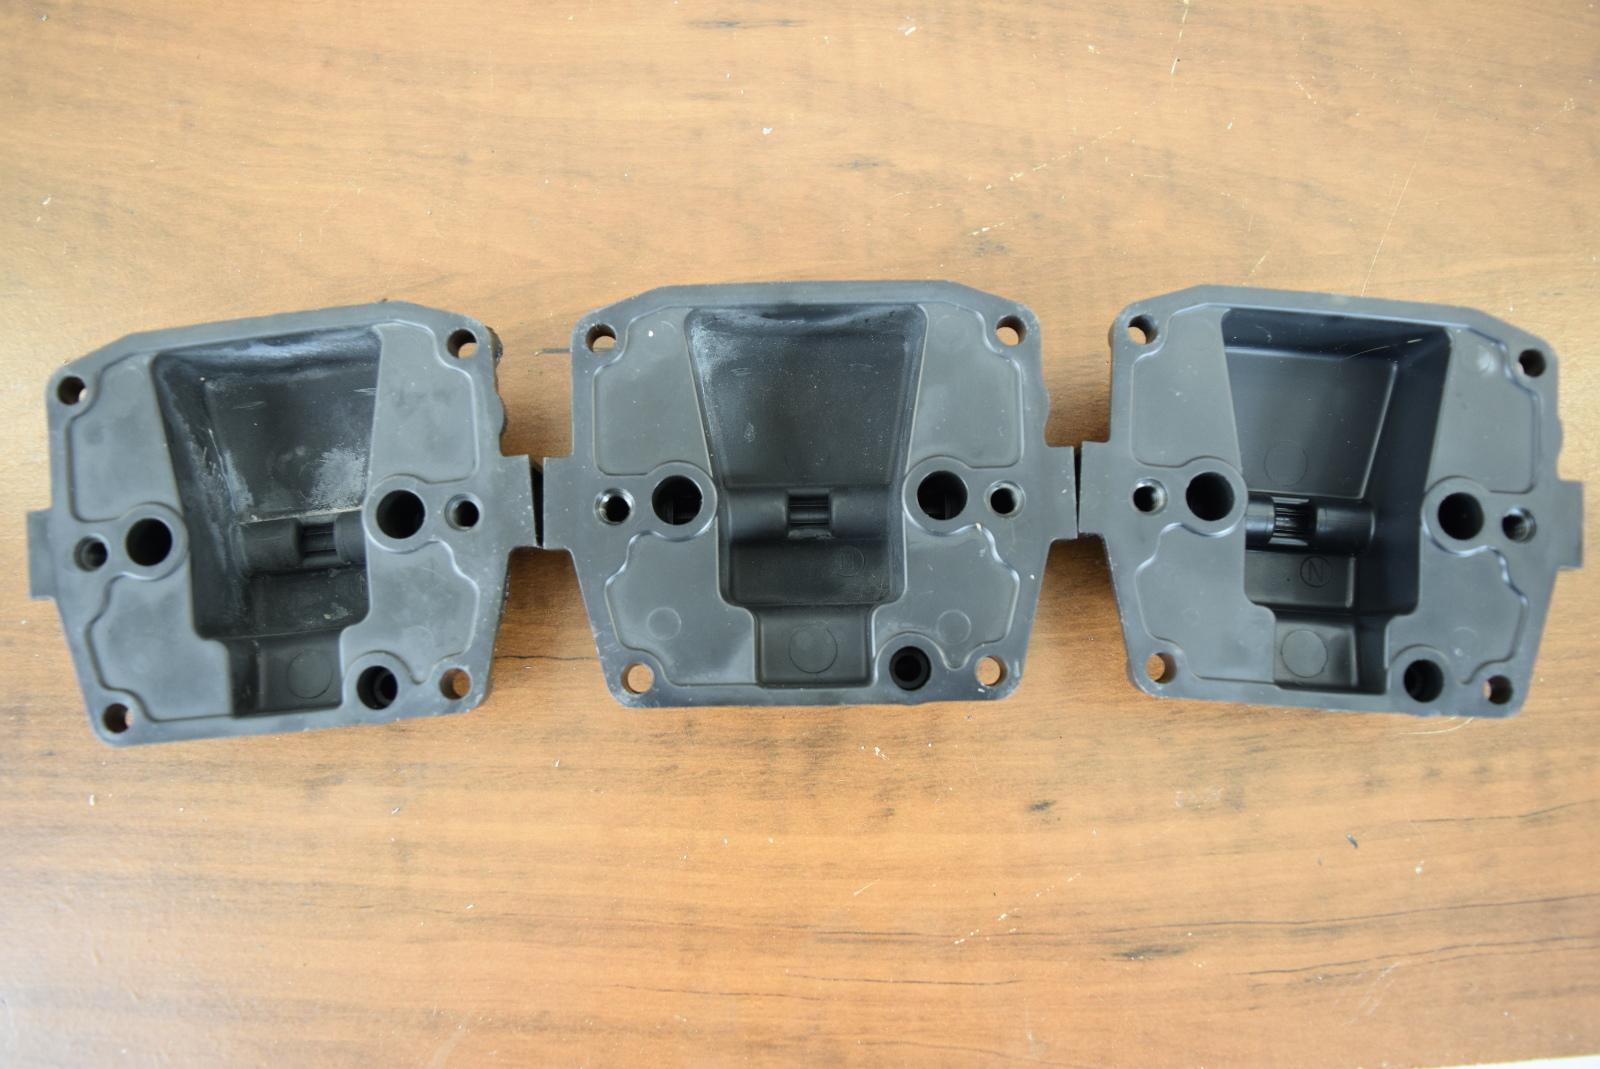 150 Hp Evinrude Outboard Parts – Articleblog info